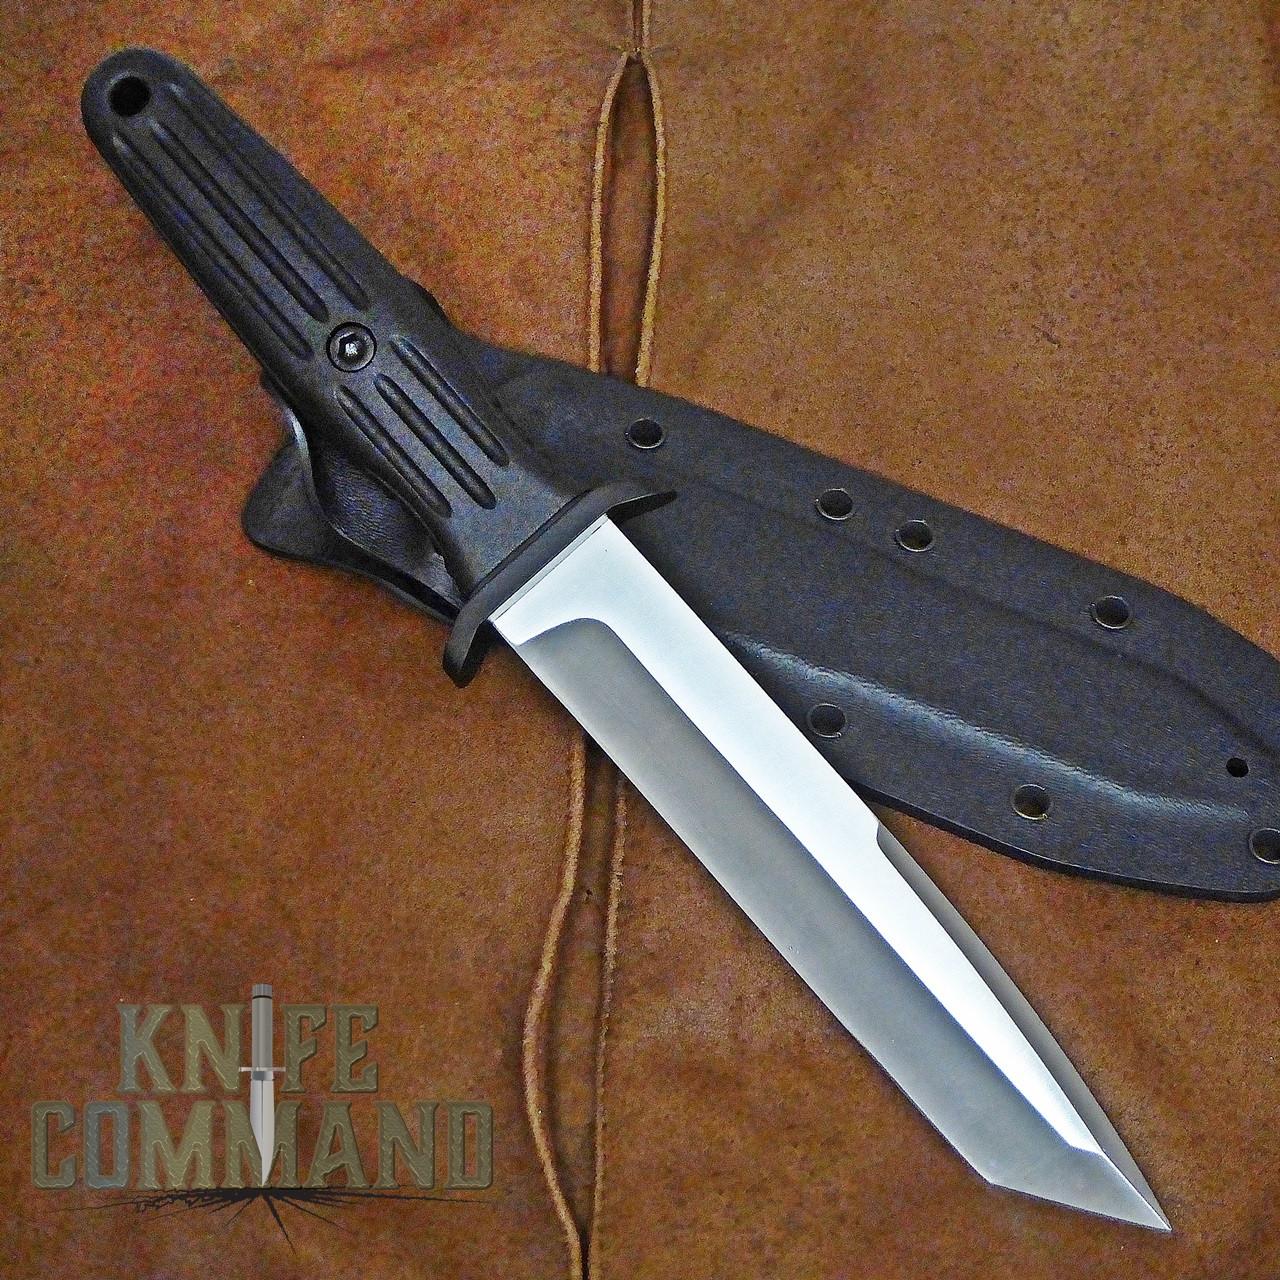 BOKER SPECIAL RUN APPLEGATE TANTO KS FIXED BLADE KNIFE 125543.  154CM steel.